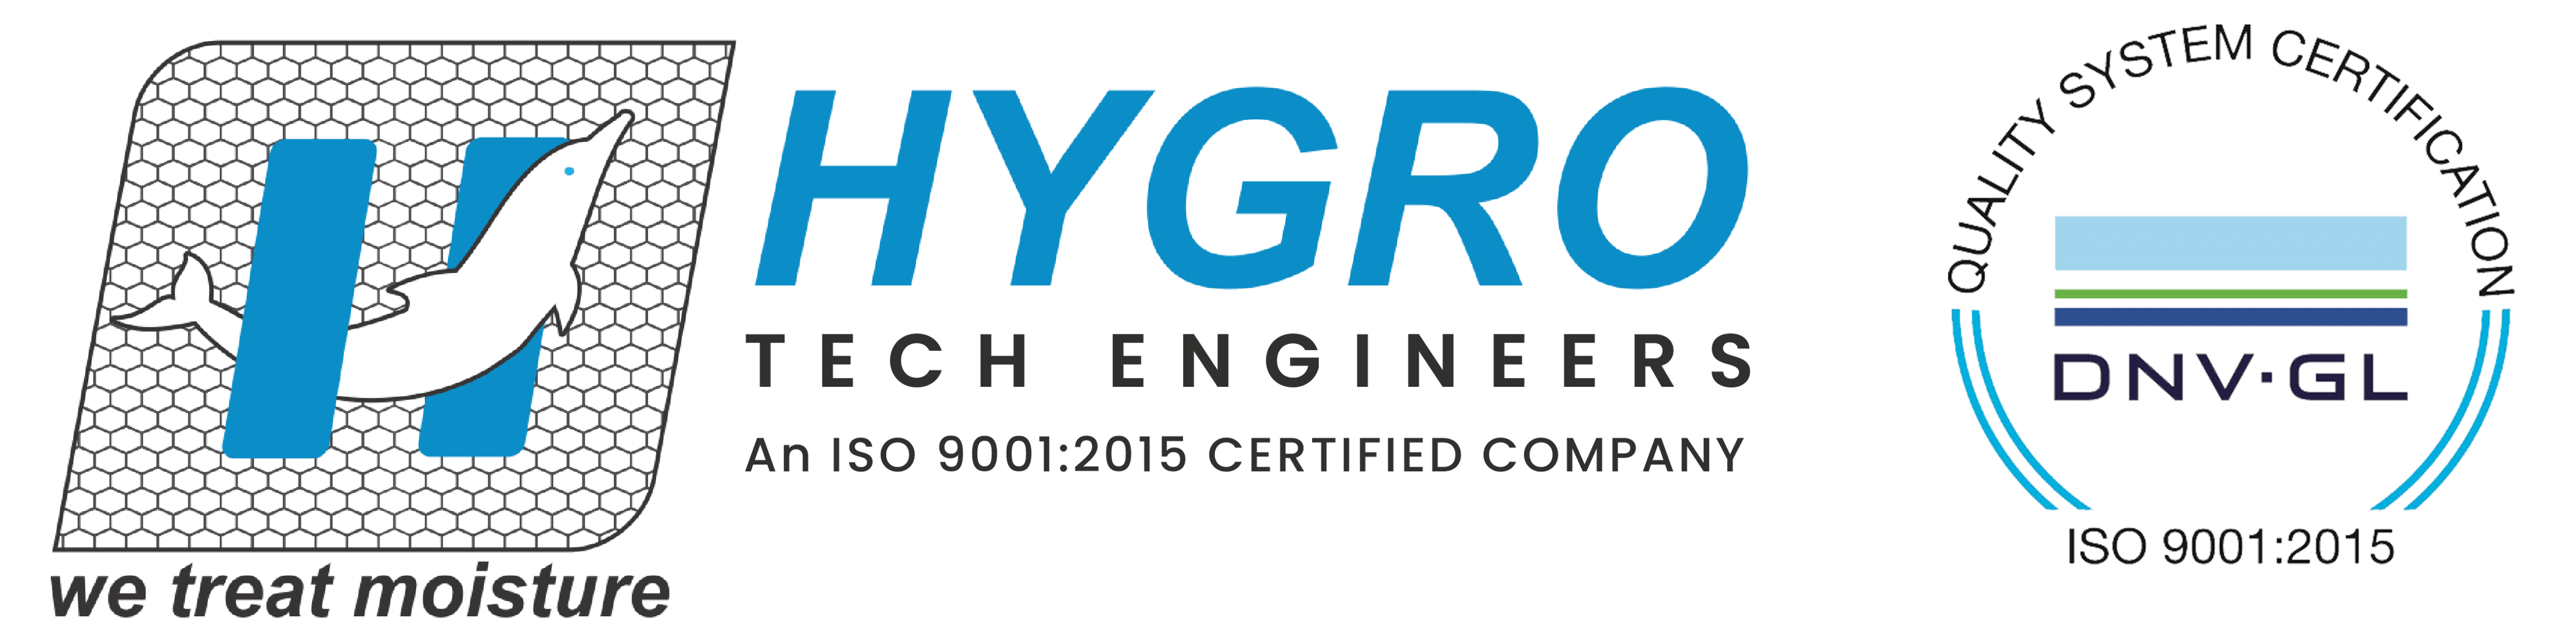 Hygro Tech Engineers